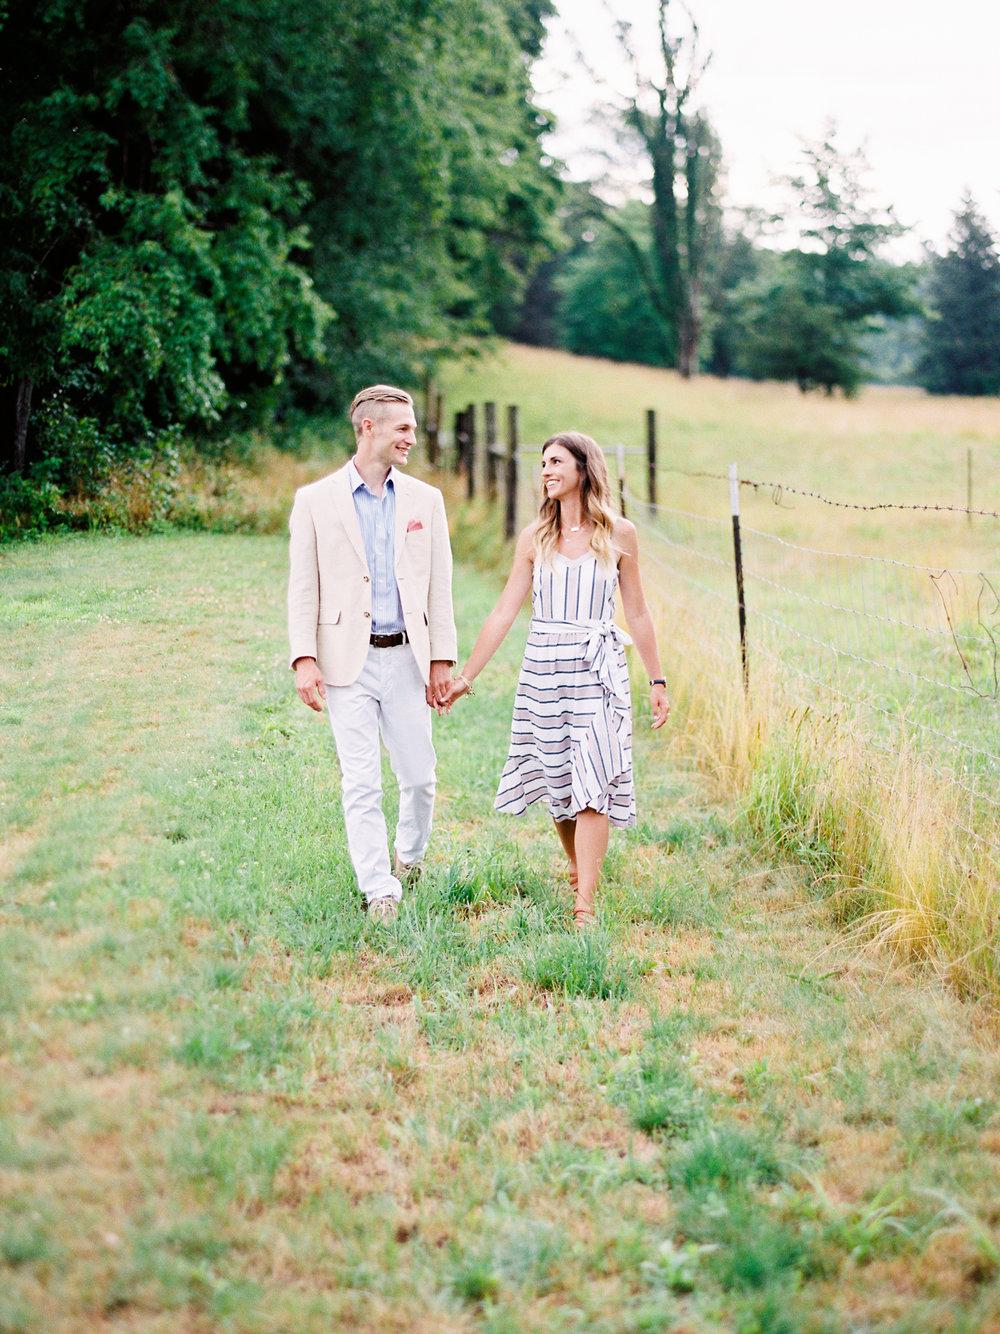 Kerri+Austin+Lavender+Field+Engagement-13.jpg